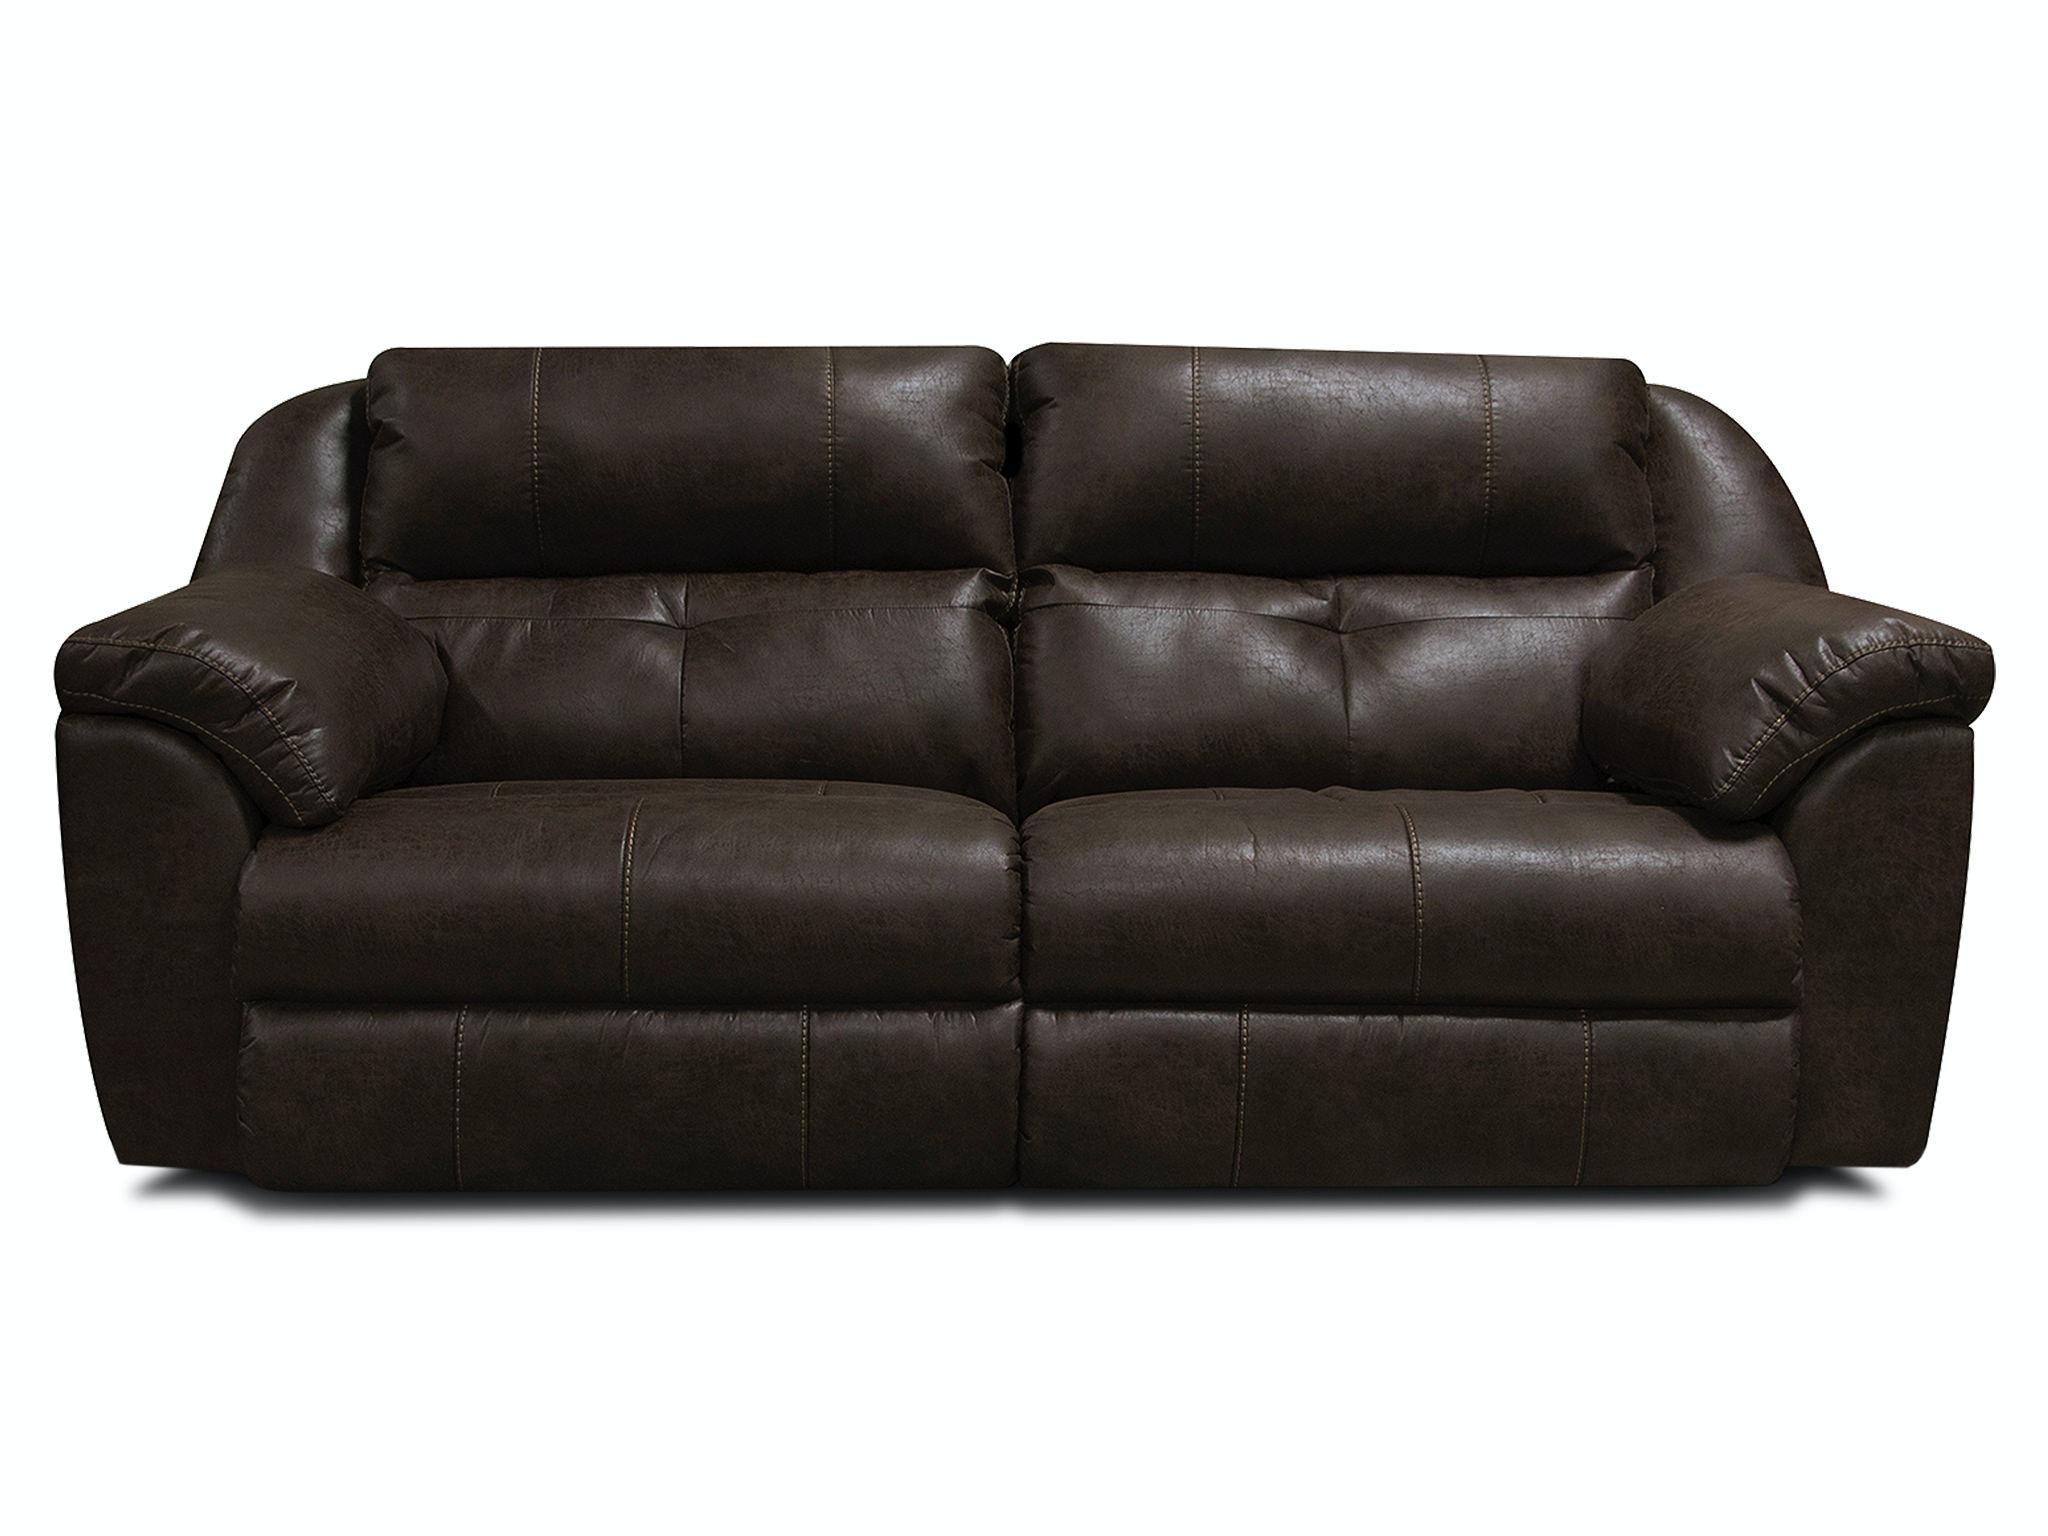 England Double Reclining Sofa EZ6D01H